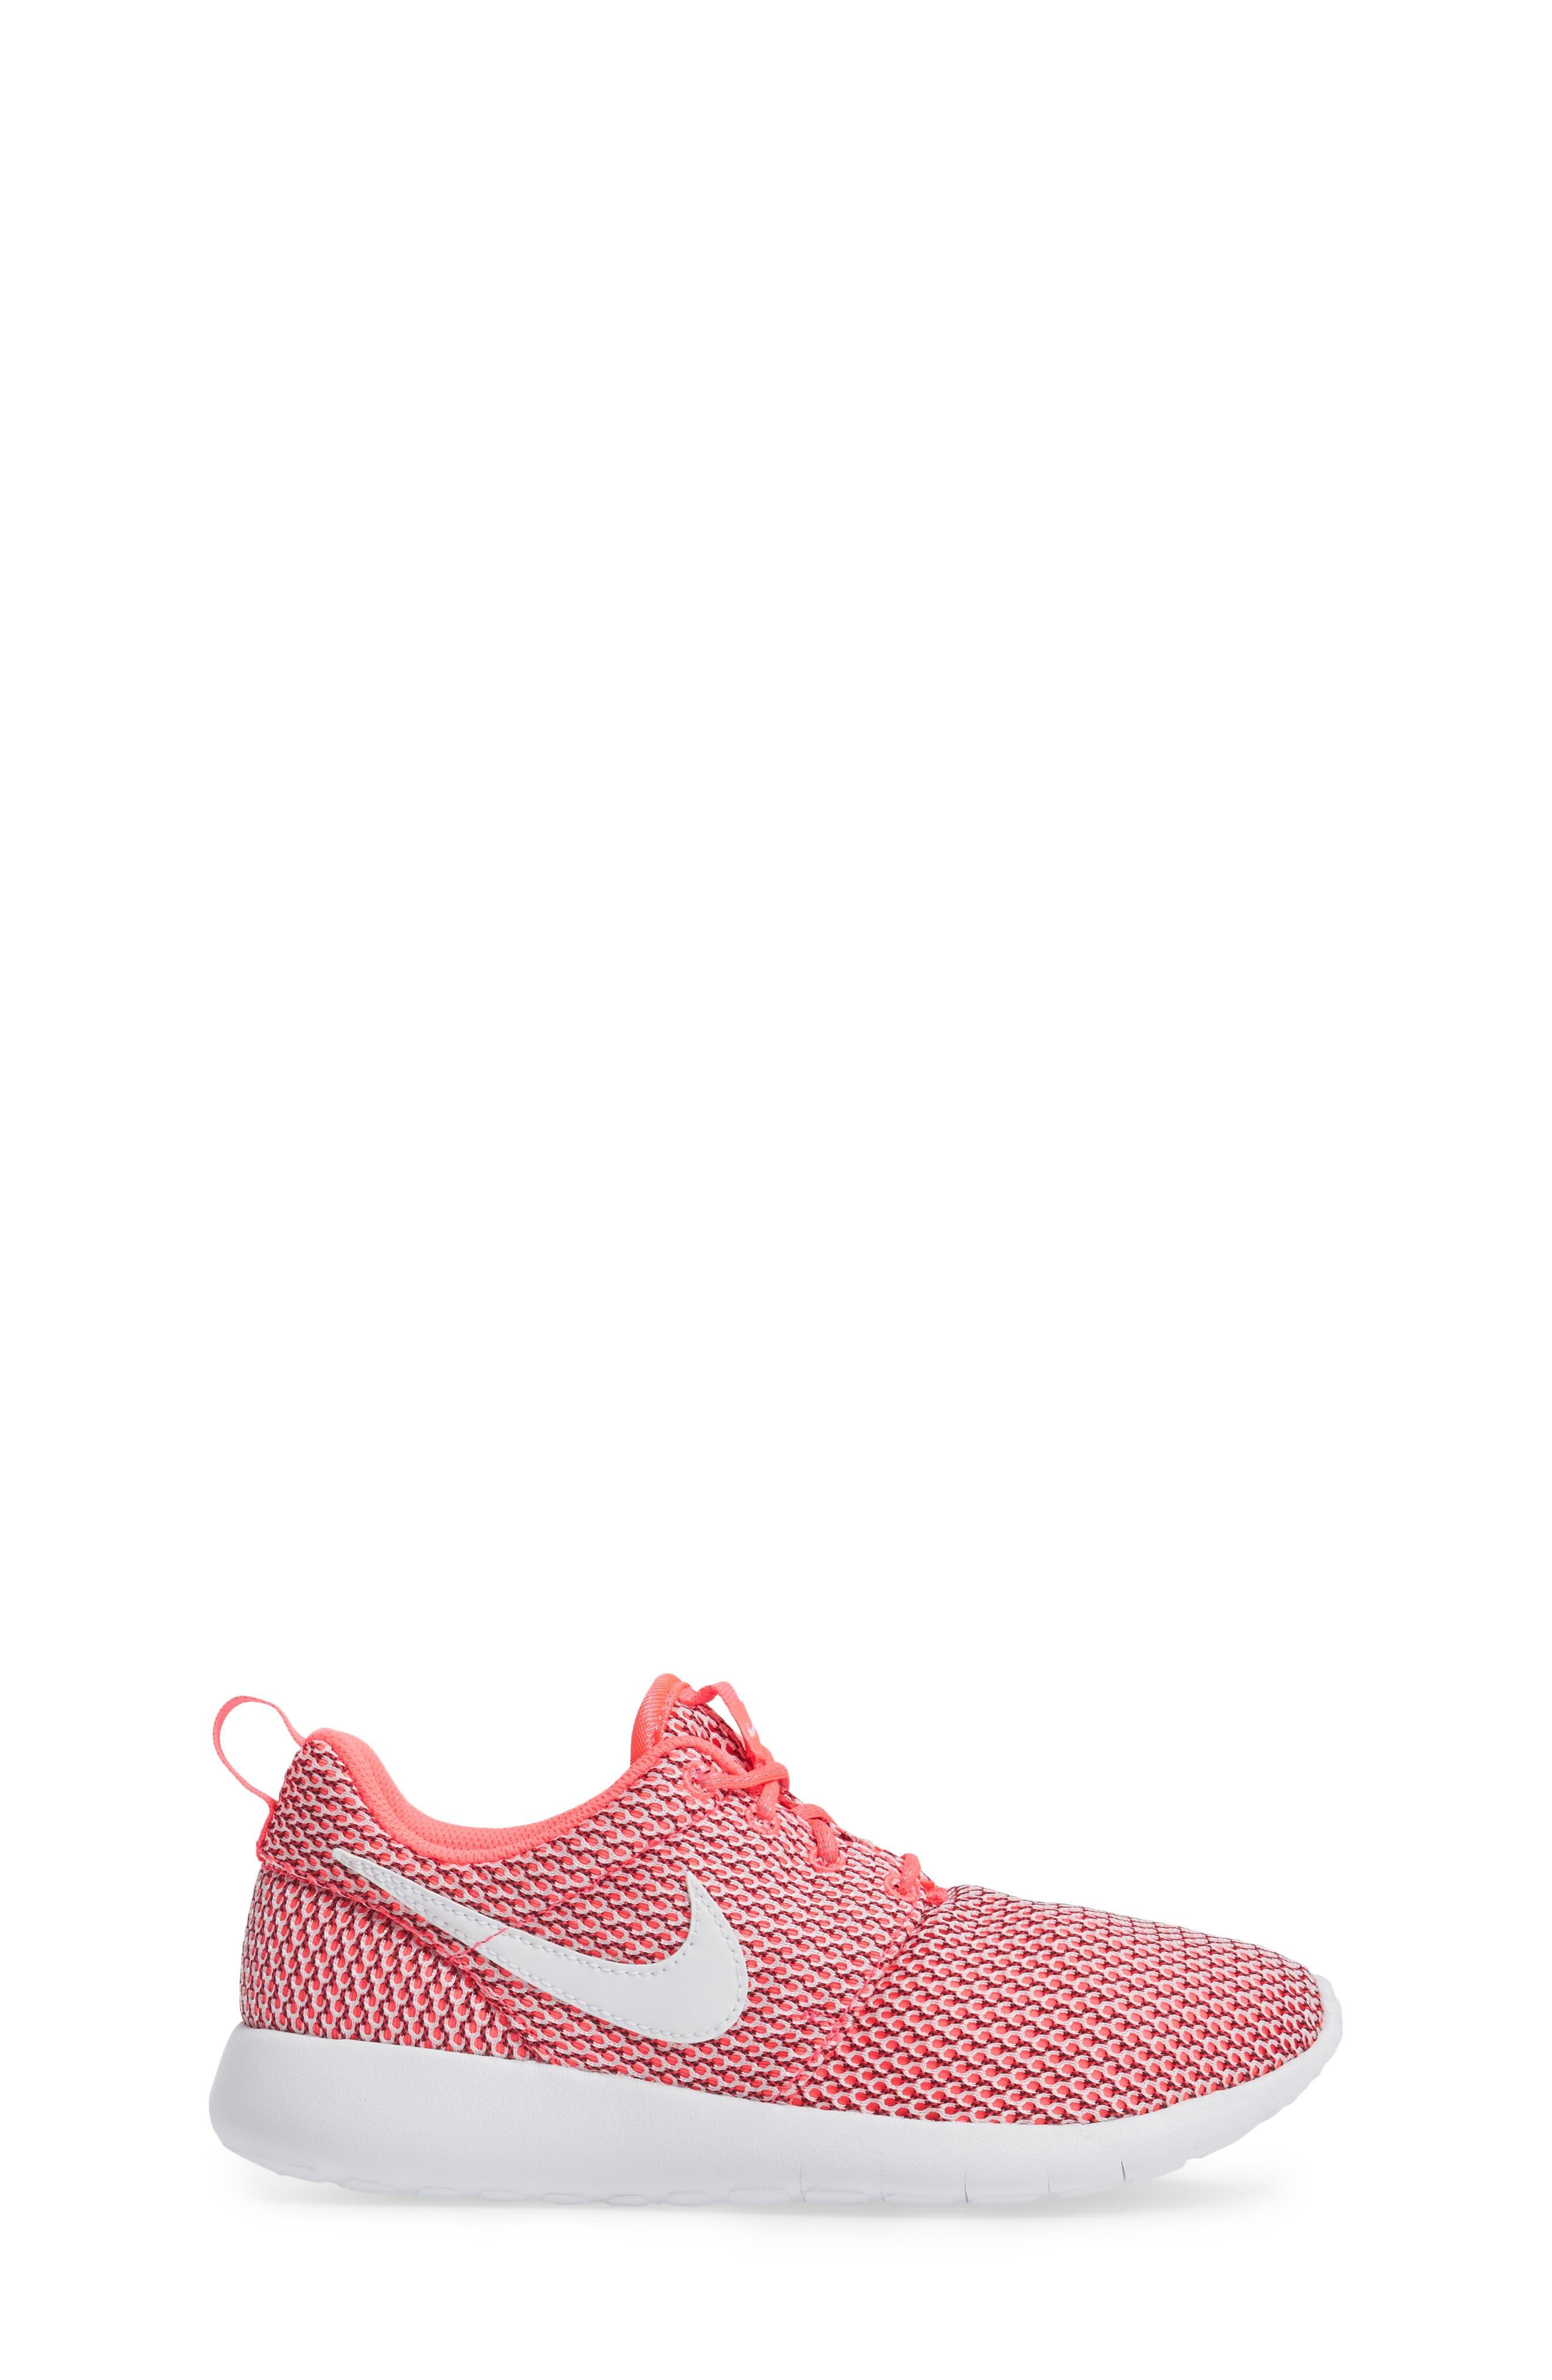 'Roshe Run' Athletic Shoe,                             Alternate thumbnail 144, color,